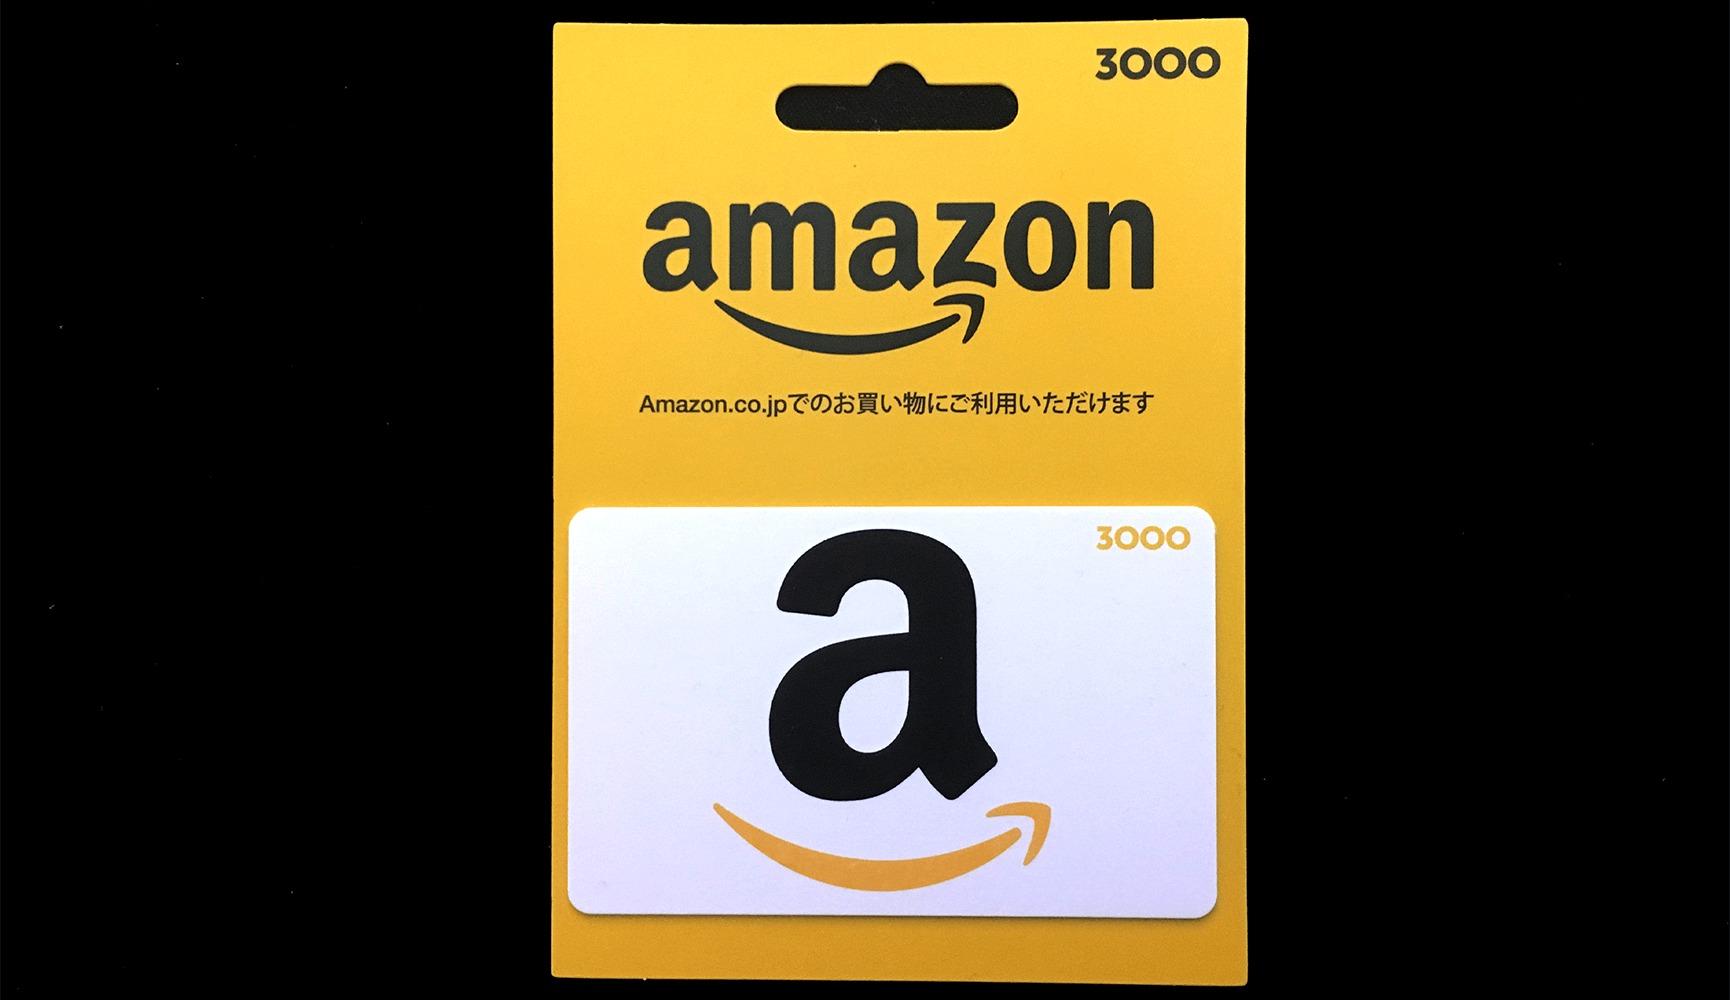 amazonギフトカードの写真